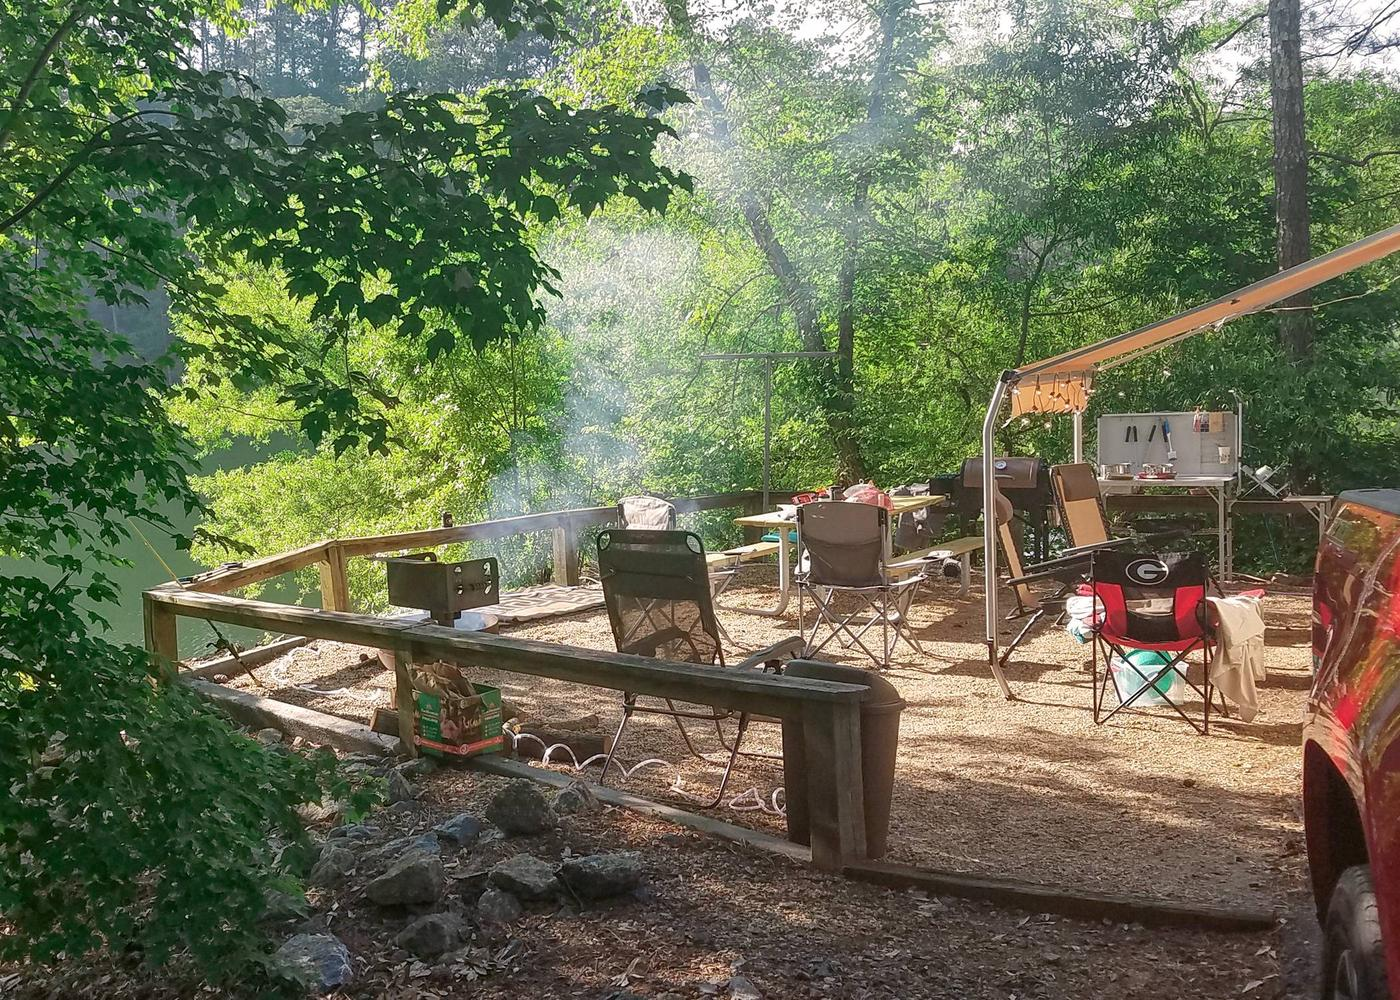 Campsite view.Upper Stamp Creek Campground, campsite 14